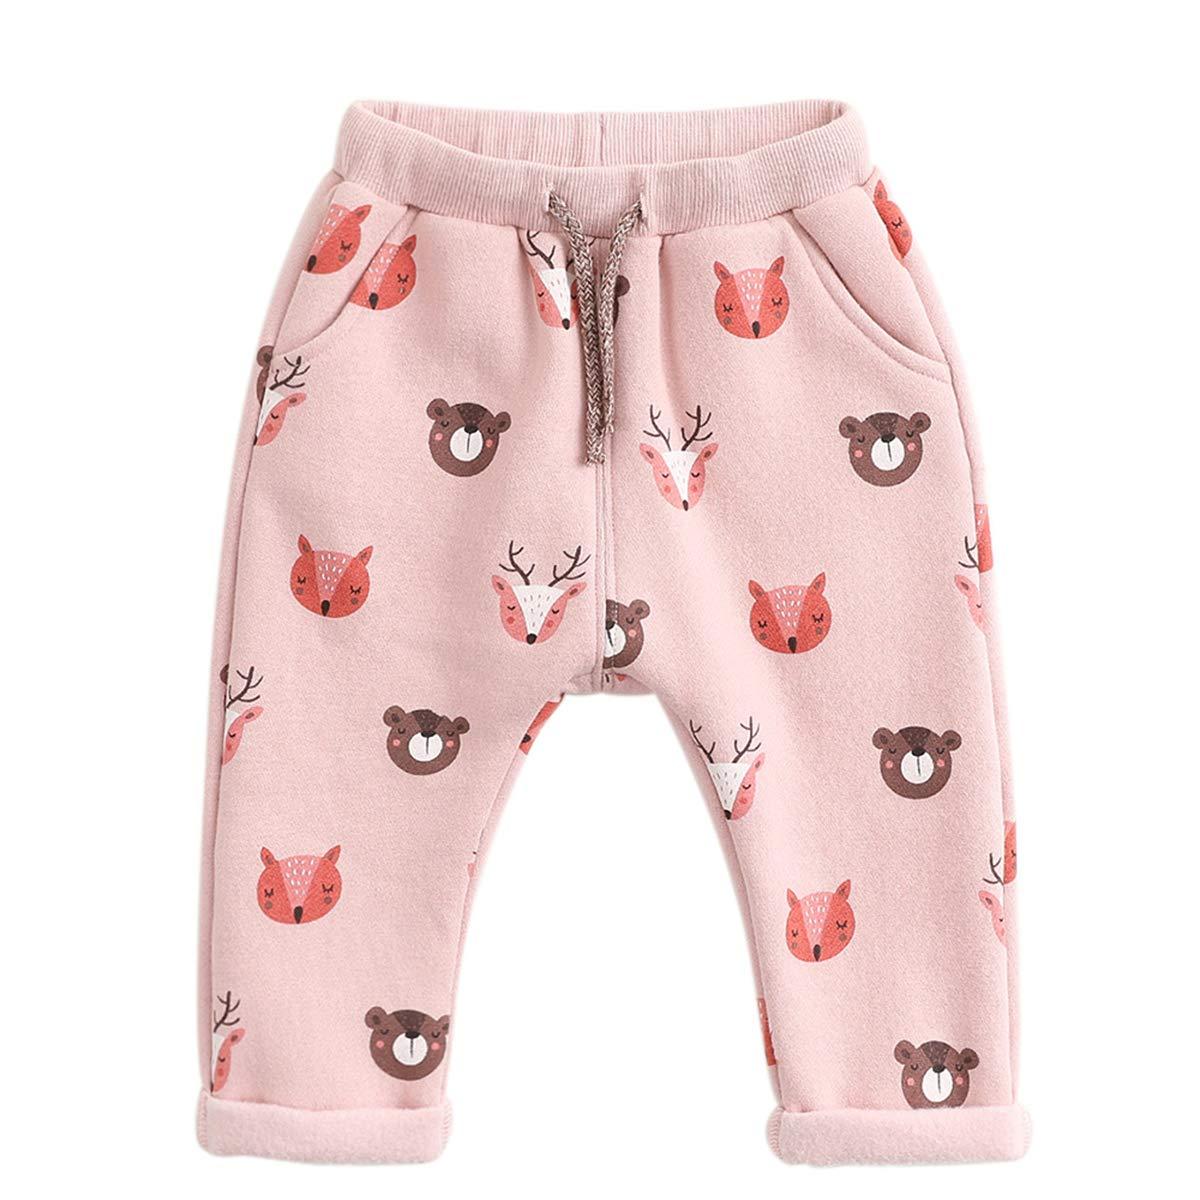 marc janie Little Girls Autumn Bear Park Sport Pants Baby Girls Trousers